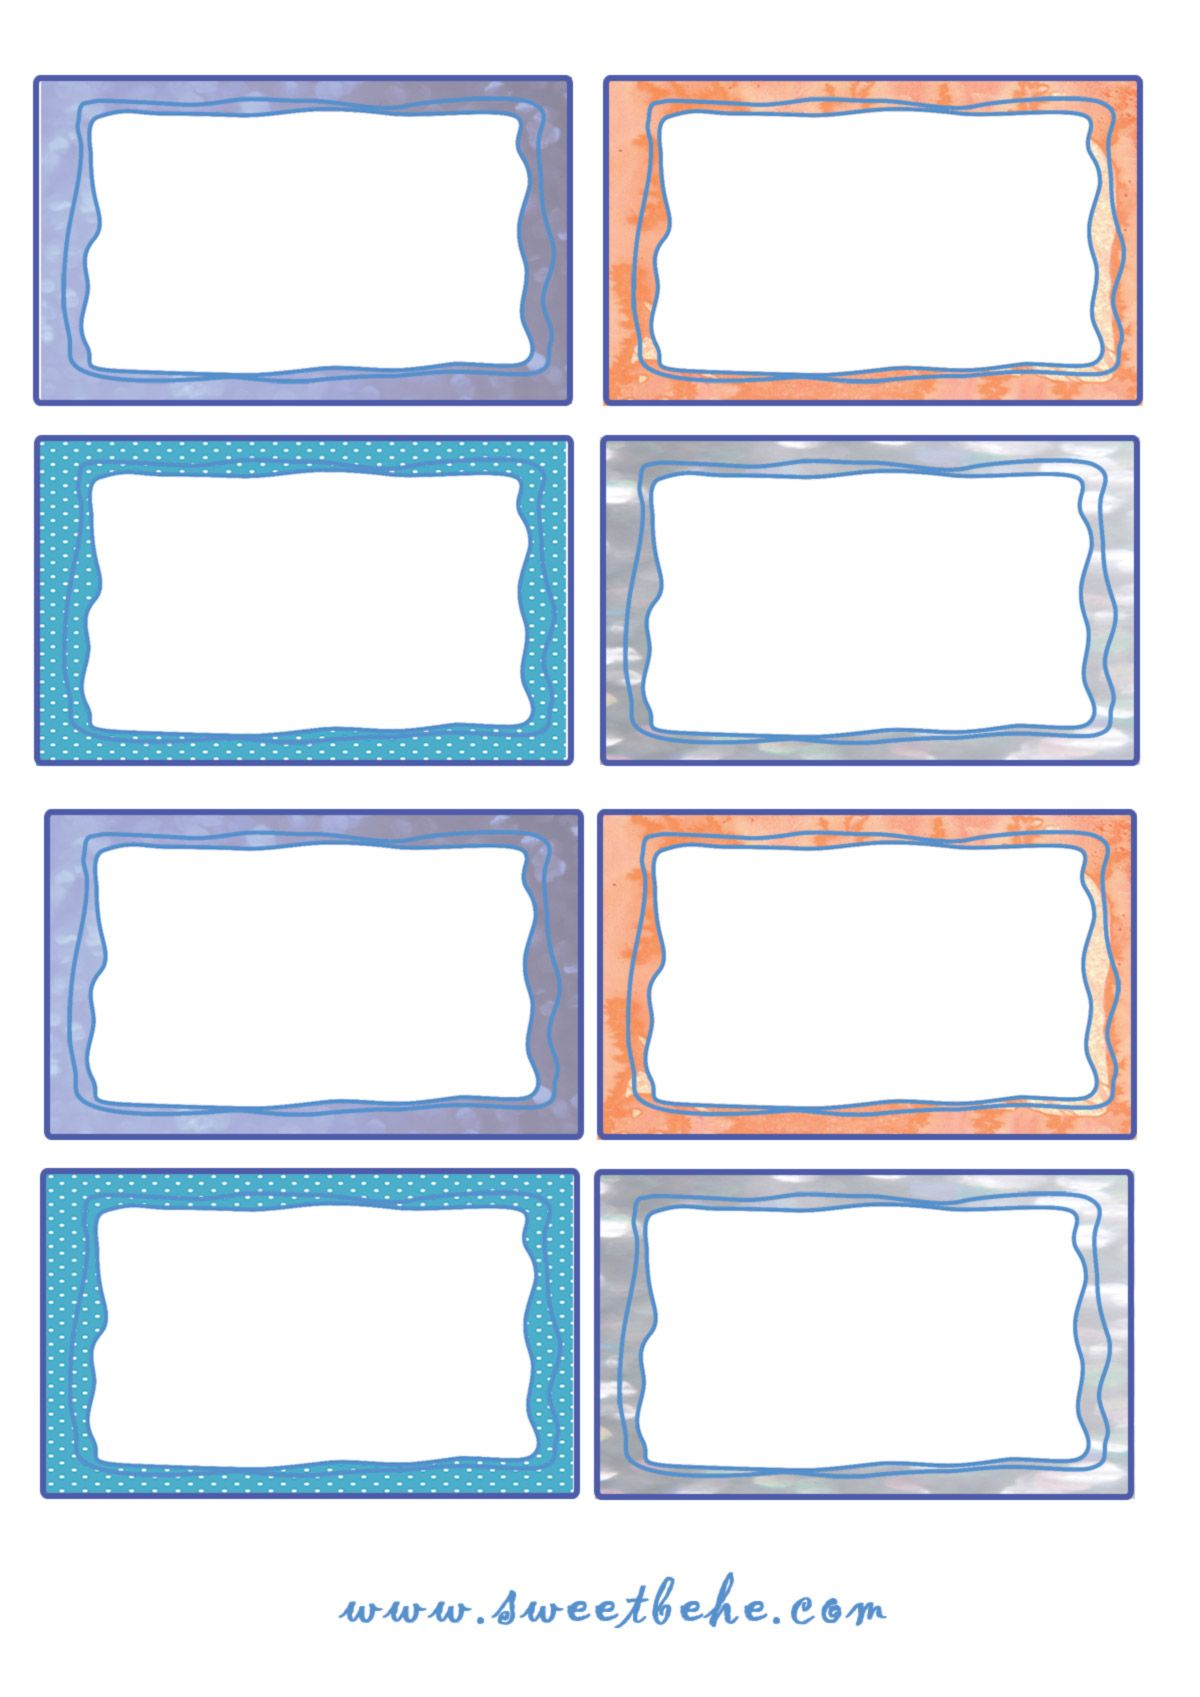 free printable} Etichette per libri e quaderni | printables ...